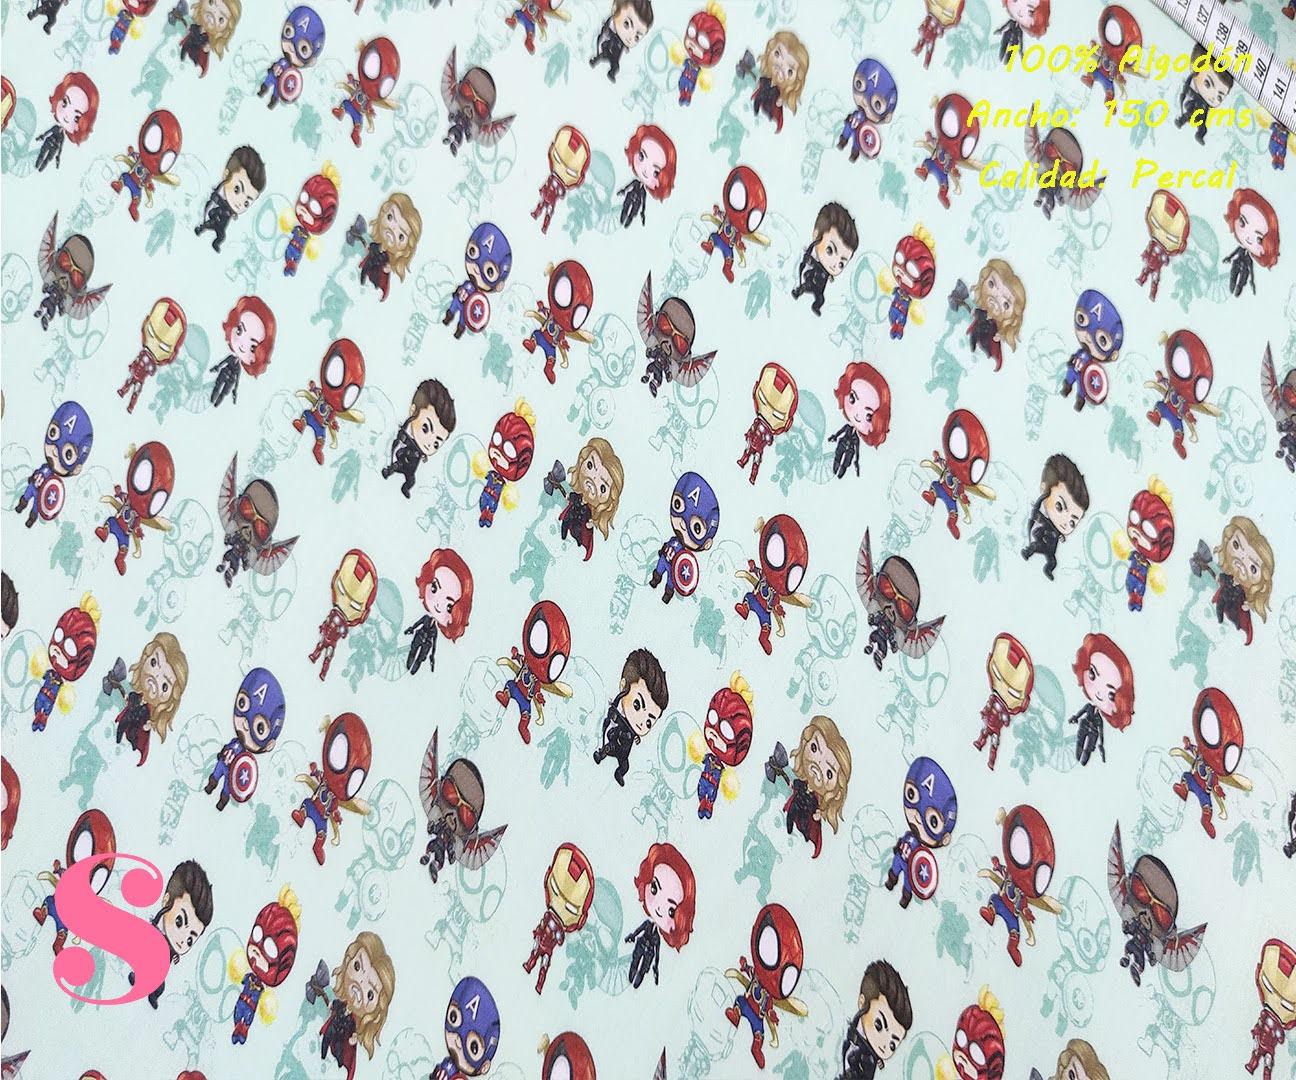 573-marvel-mini-personajes-tejidos-algodón-estampado-percal,Tejido Estampado Mini Personajes Marvel